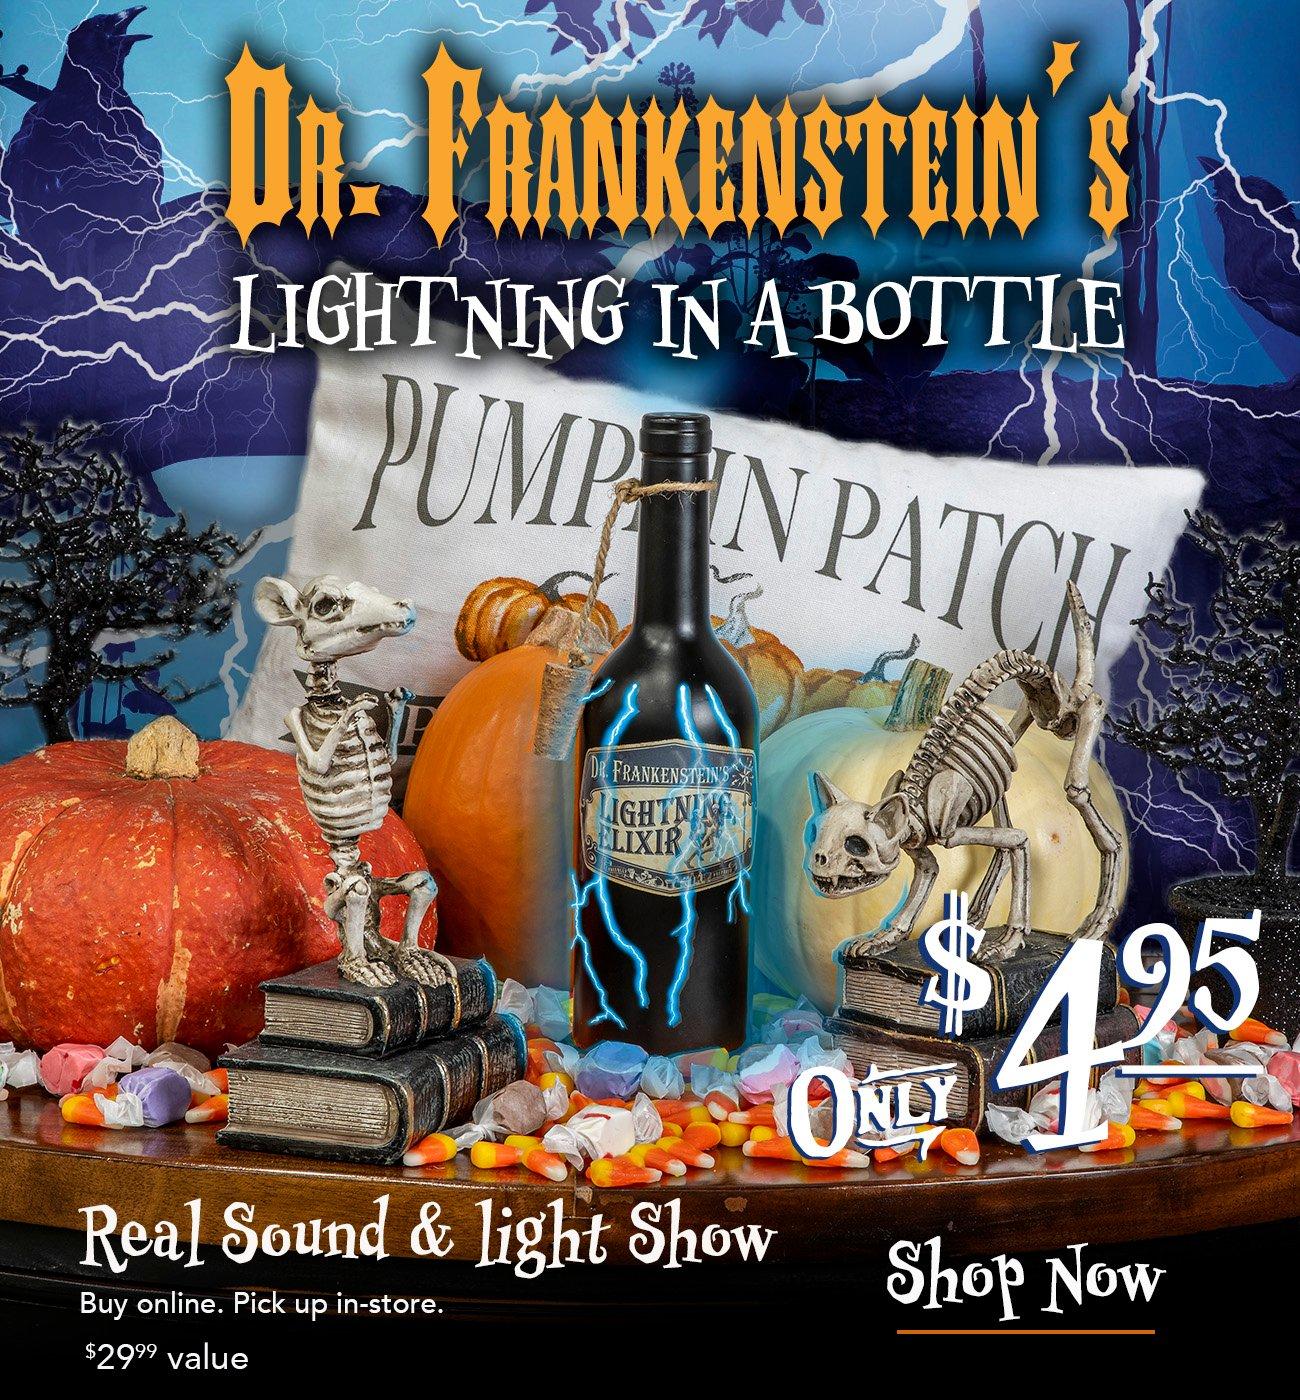 Dr-frankenstein-bottle